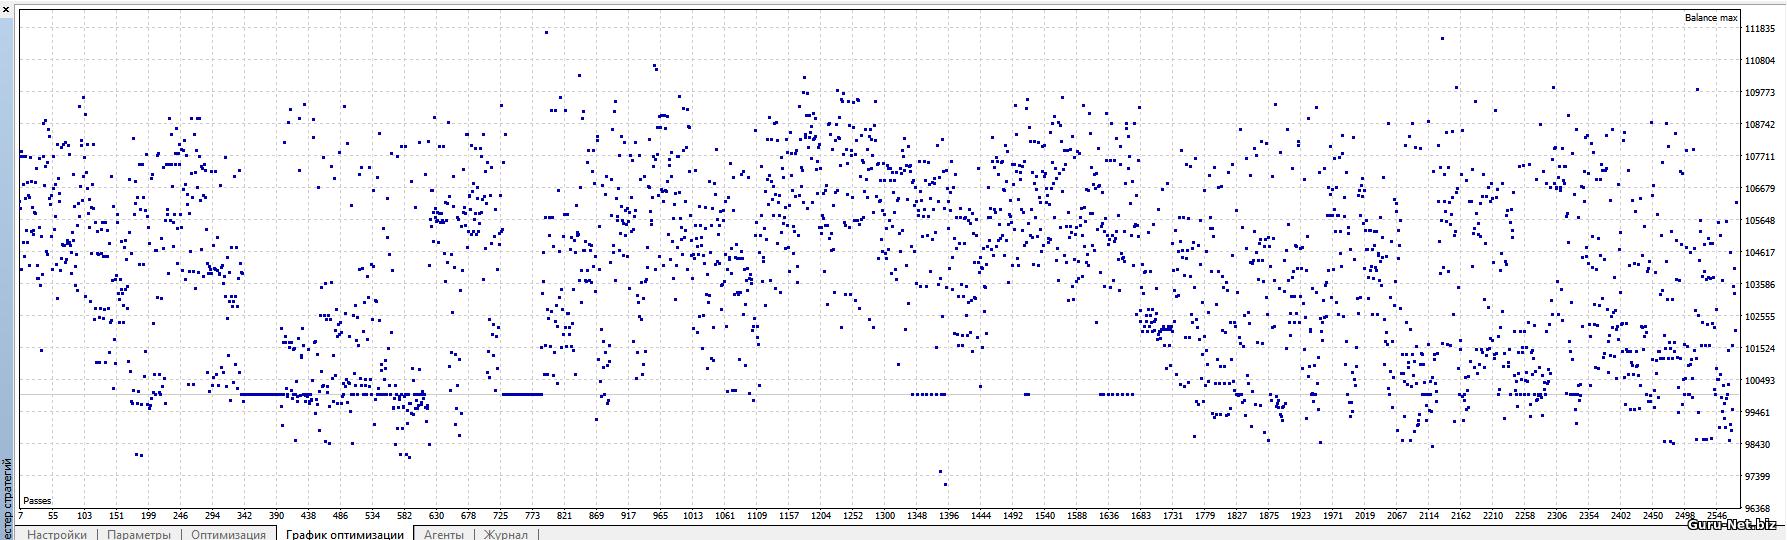 График оптимизации сигнала на вход в сделку